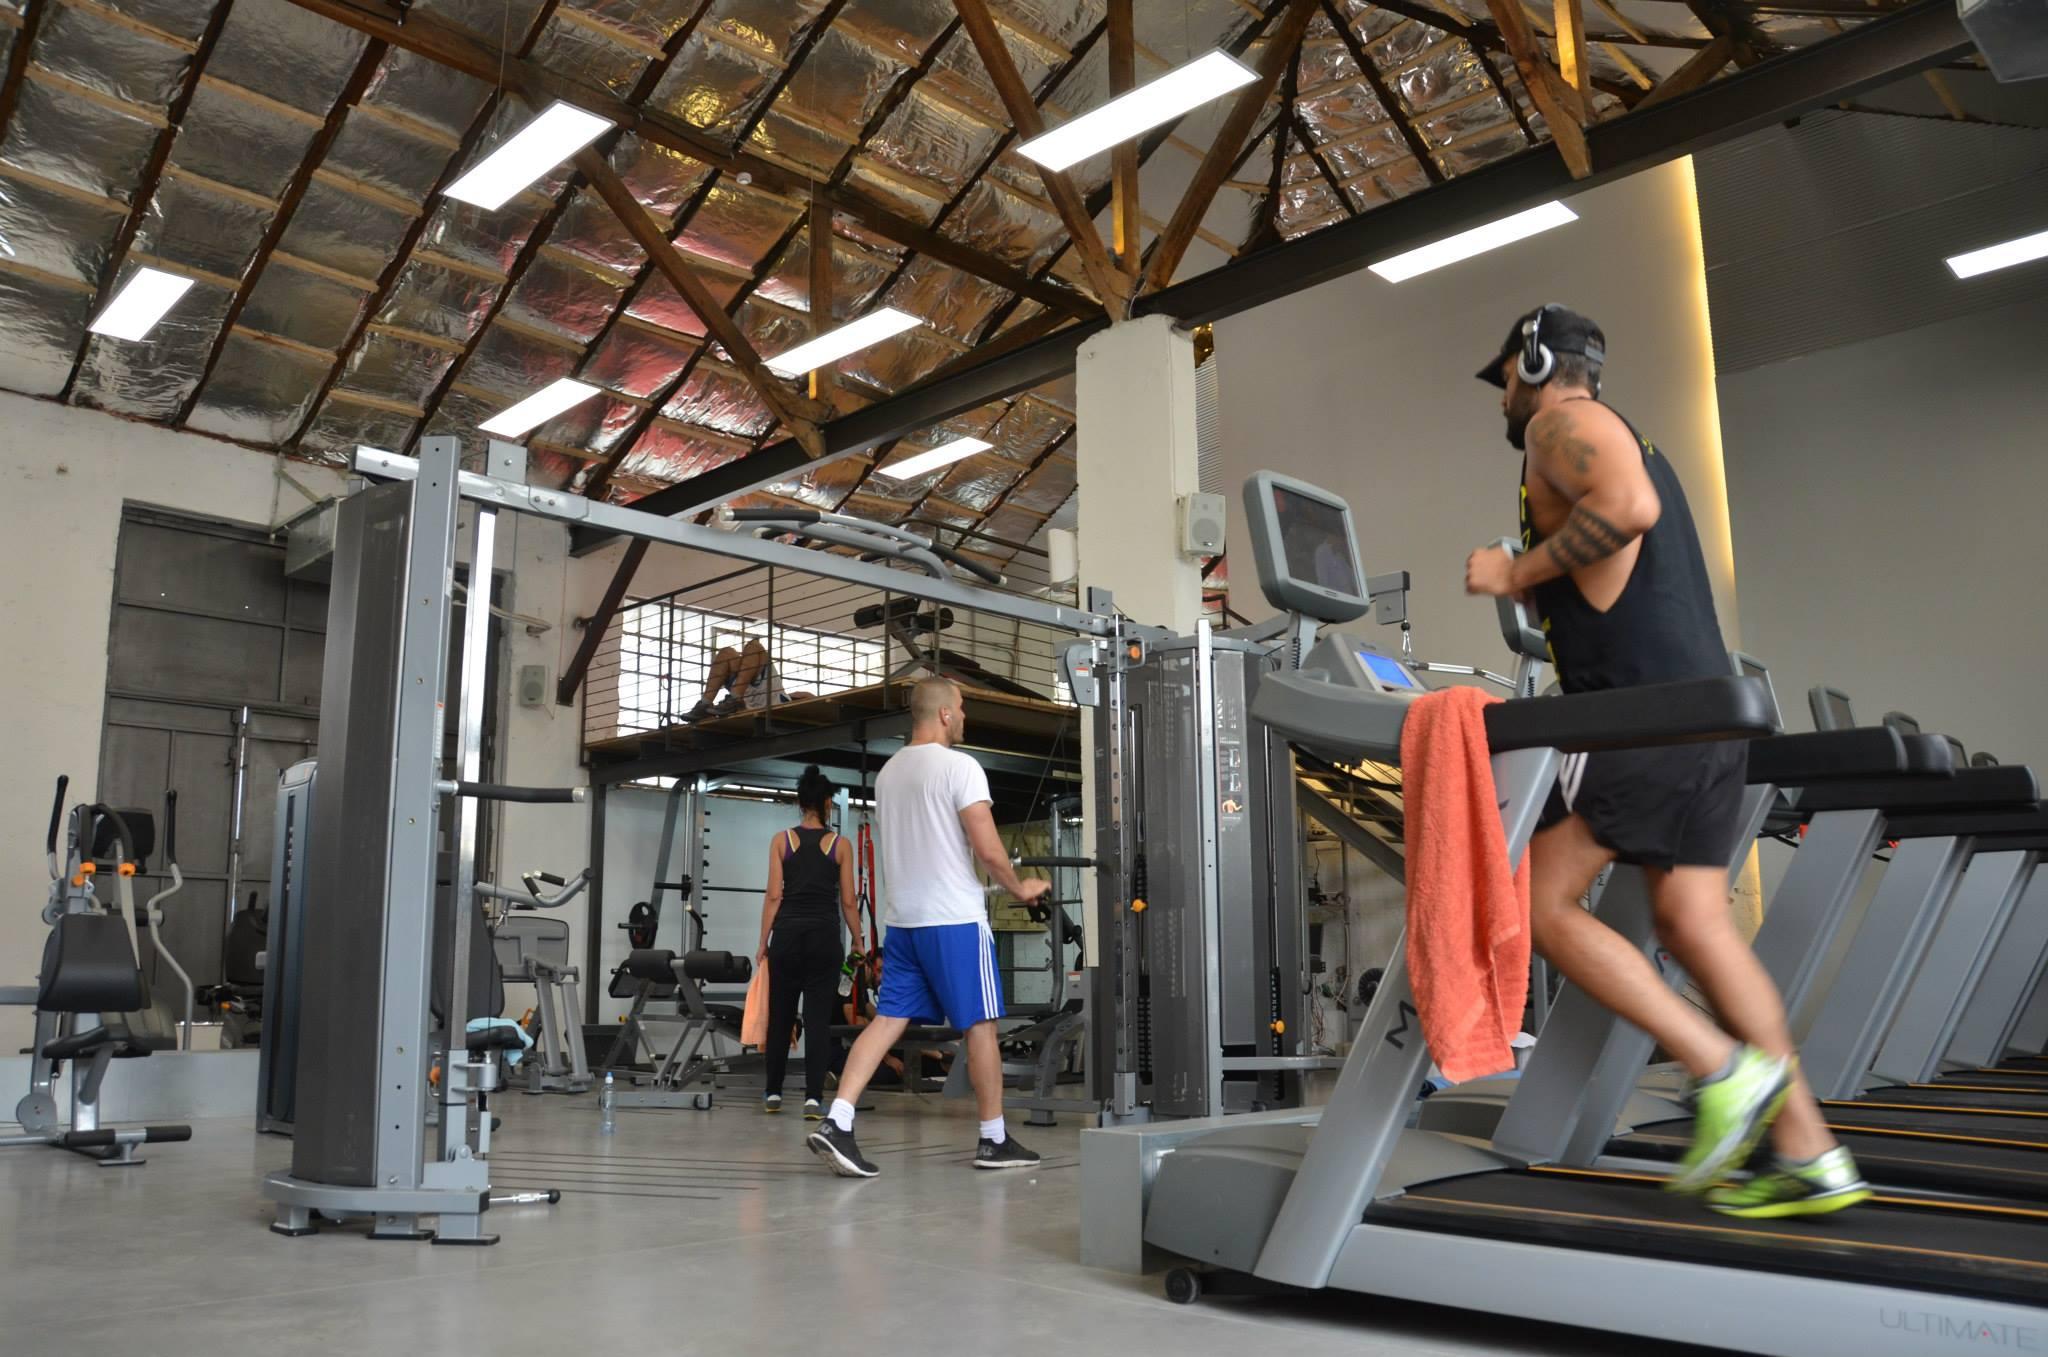 Gym in florentine tel aviv